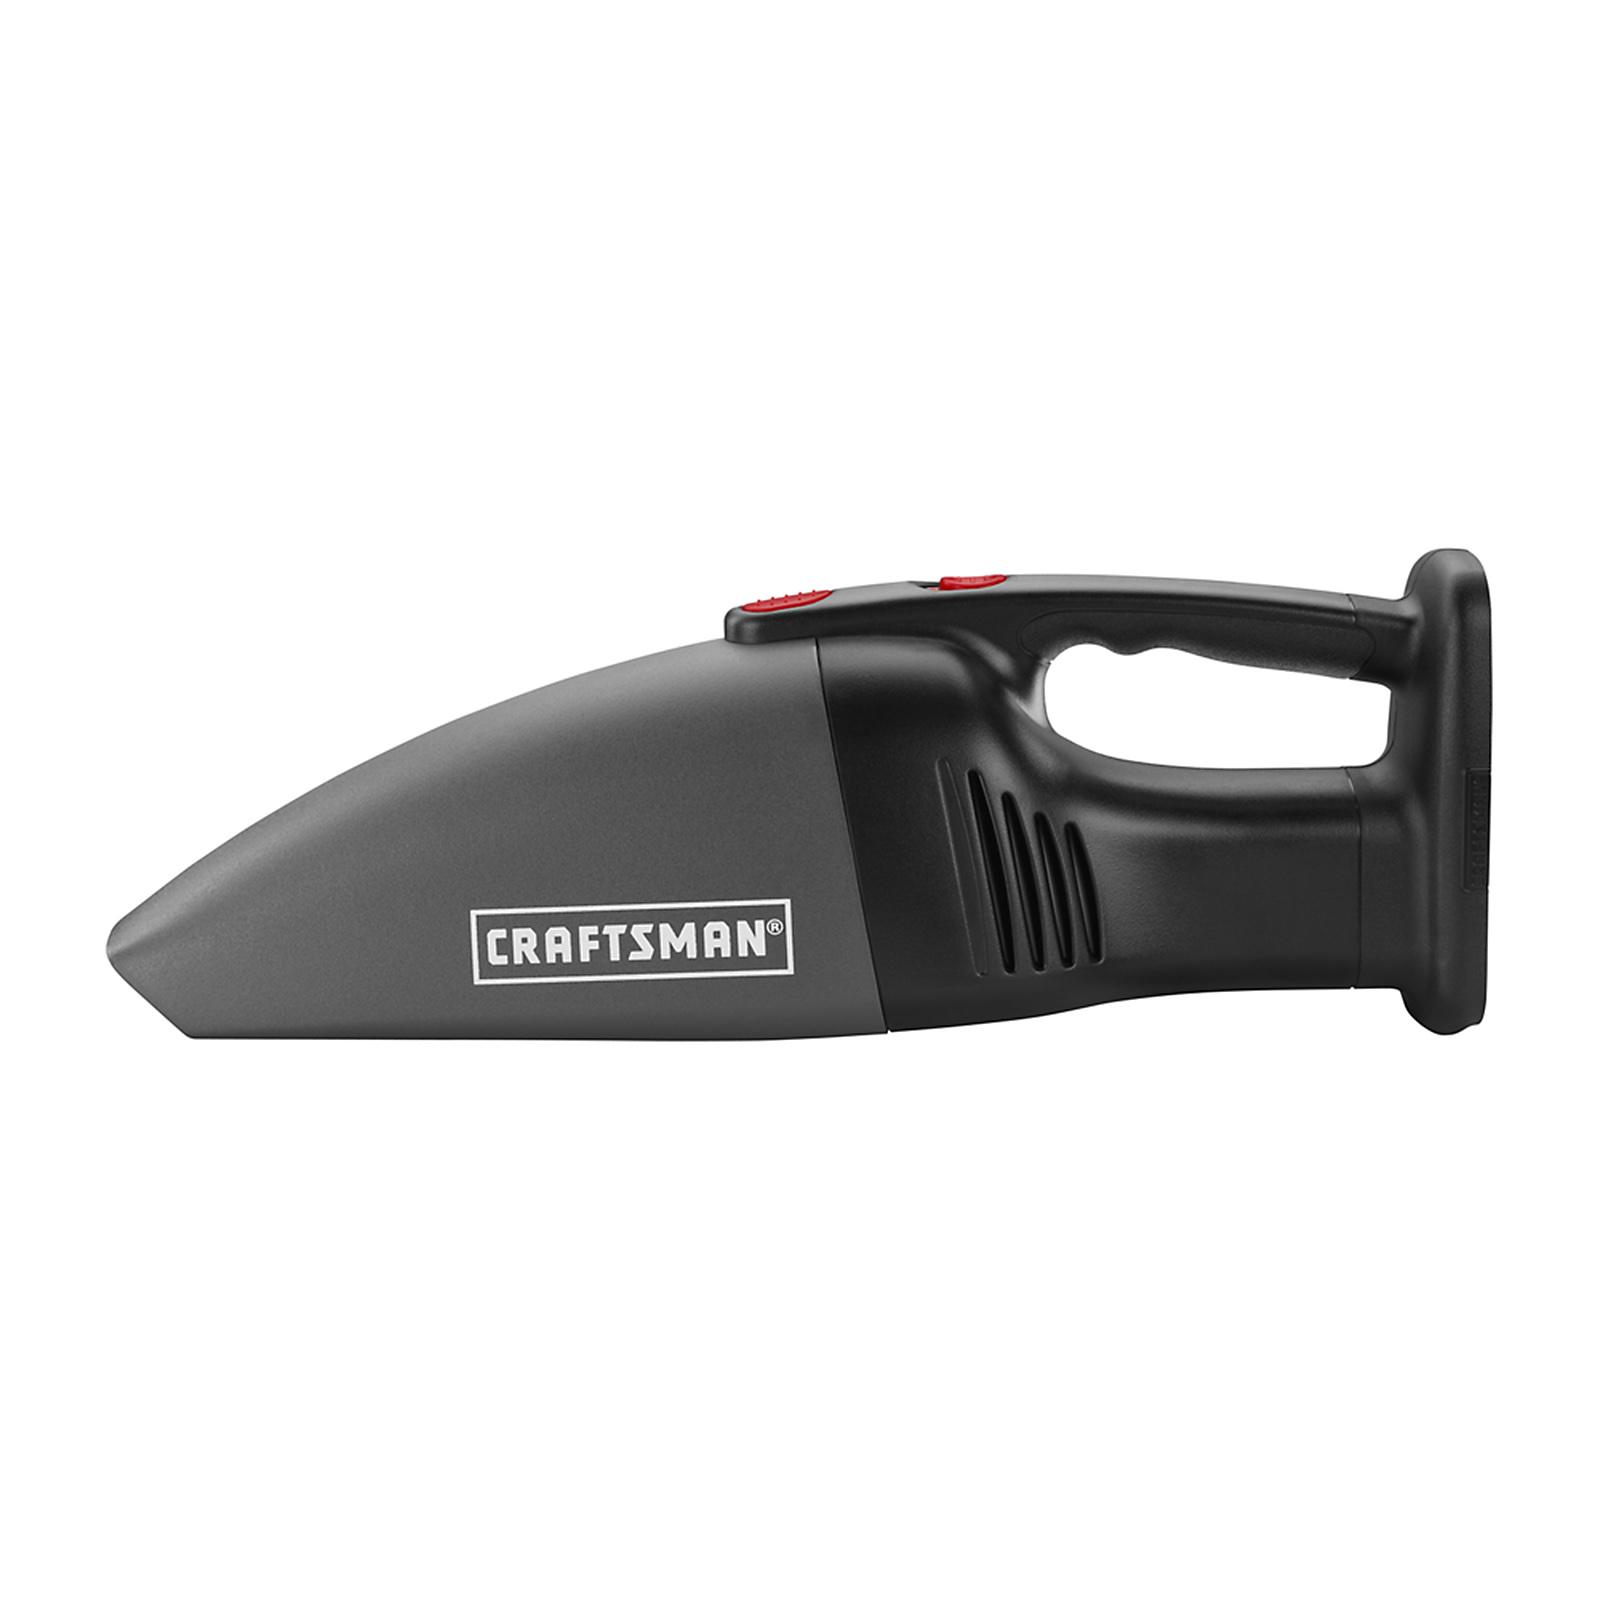 Craftsman C3 19.2 volt Hand Vac